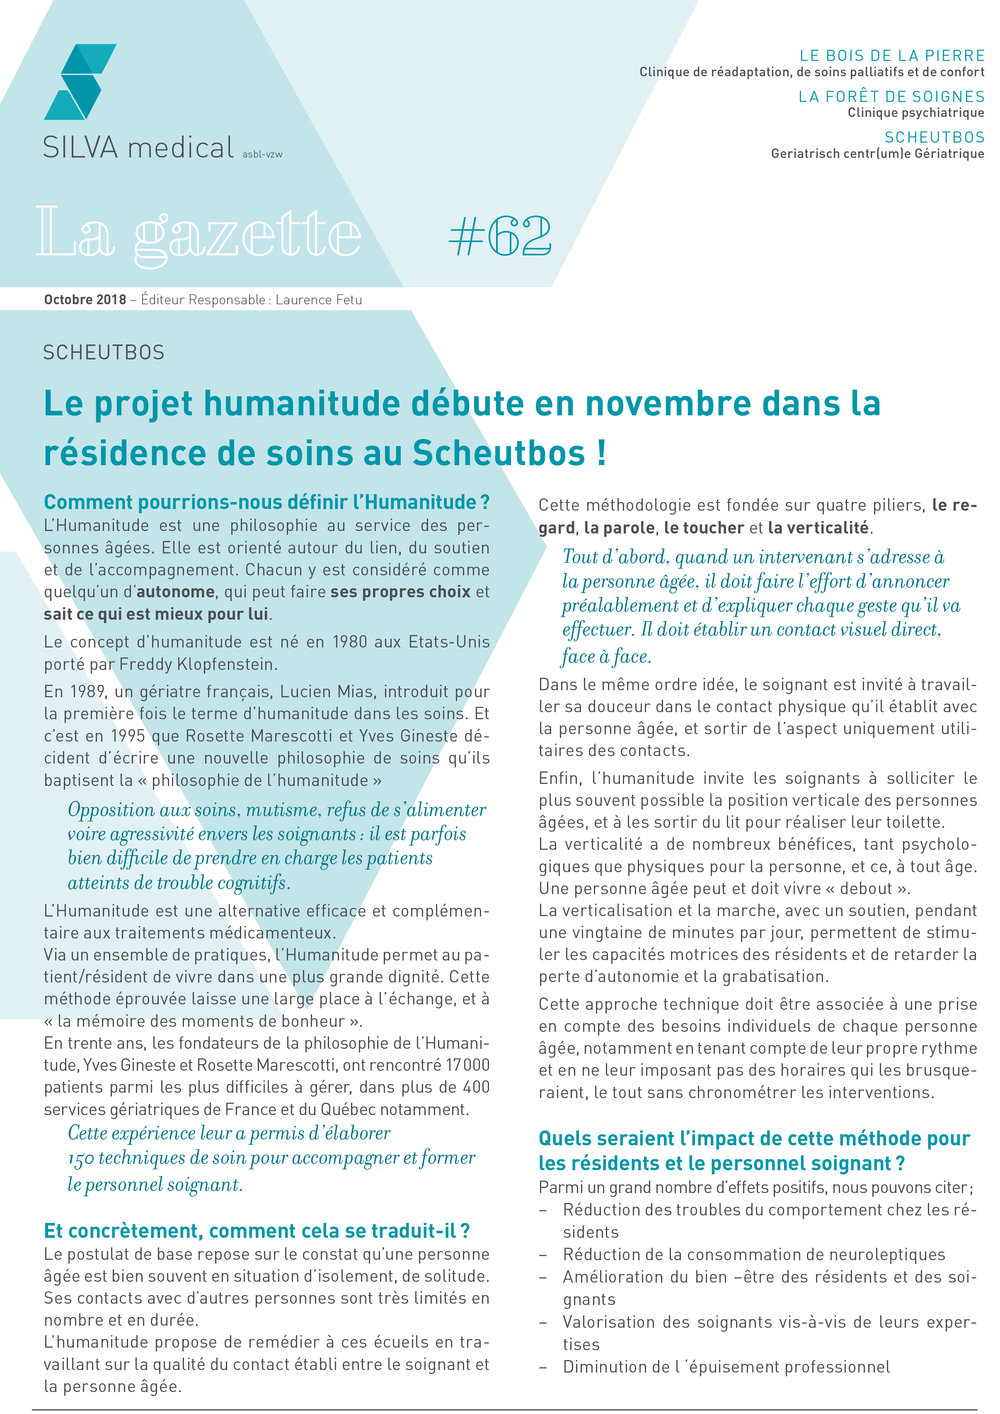 gazette#62FR#2-1.jpg